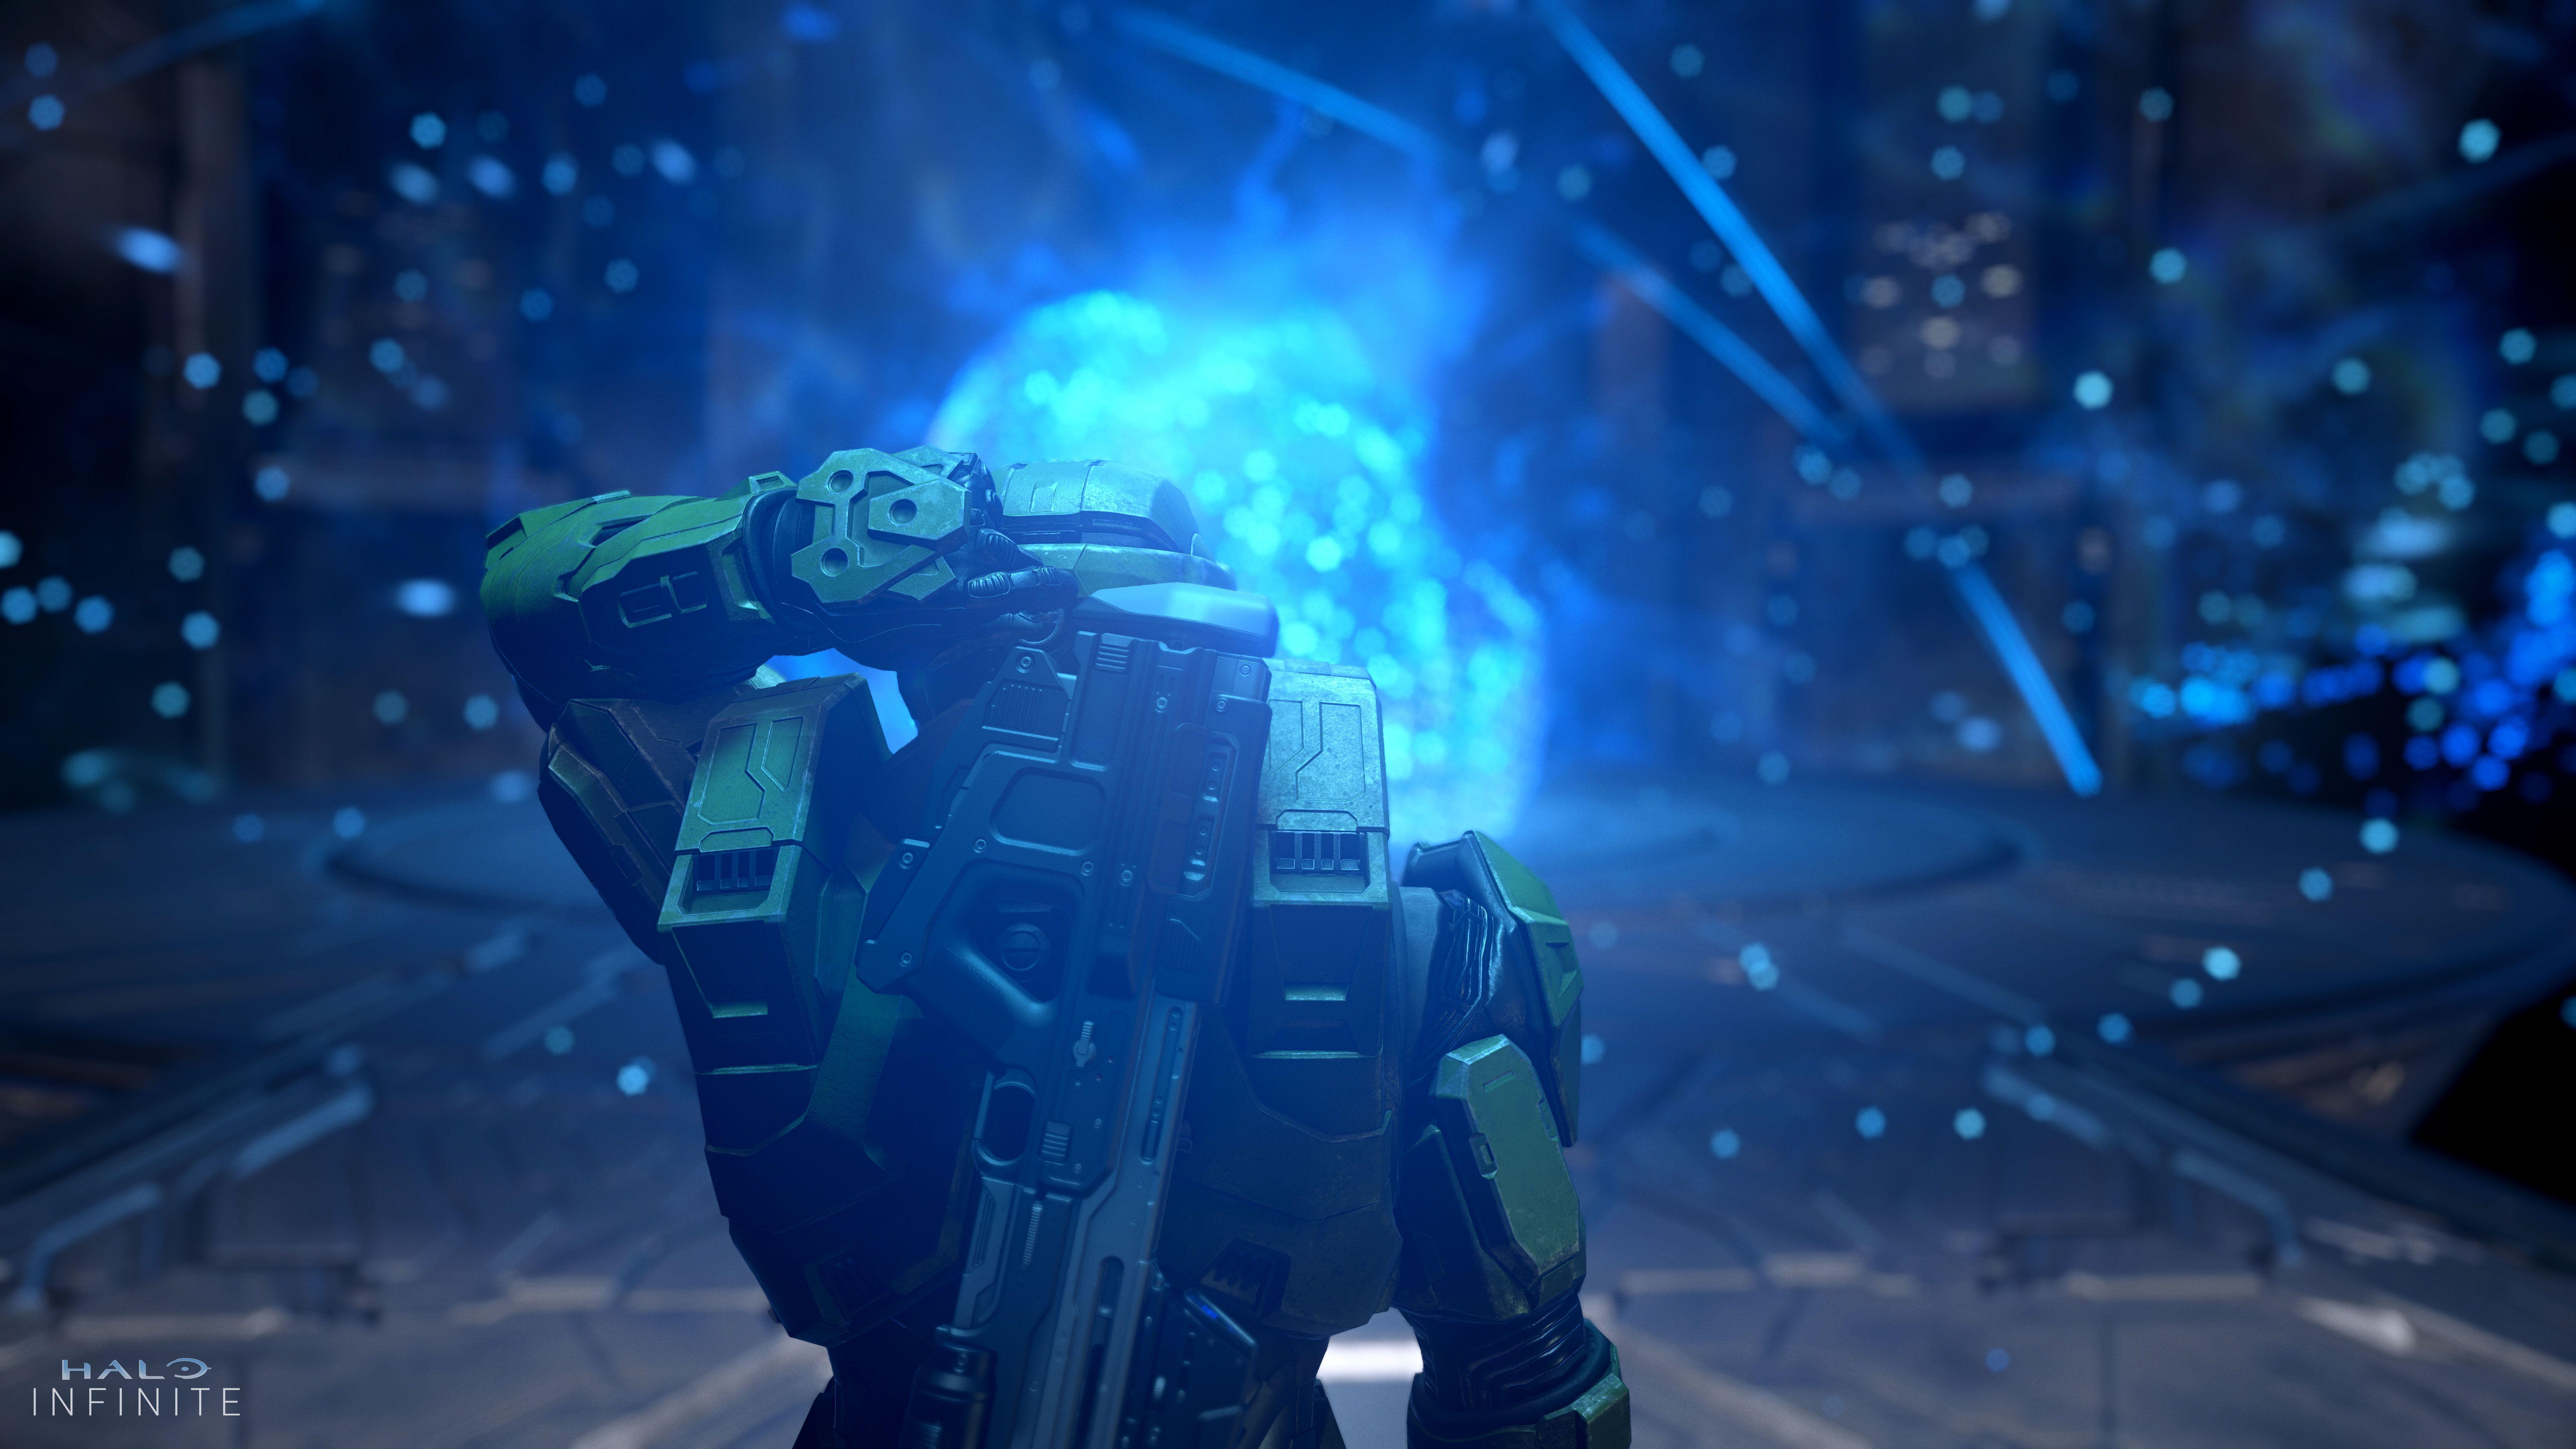 Halo Infinite Desktop Wallpapers Top Free Halo Infinite